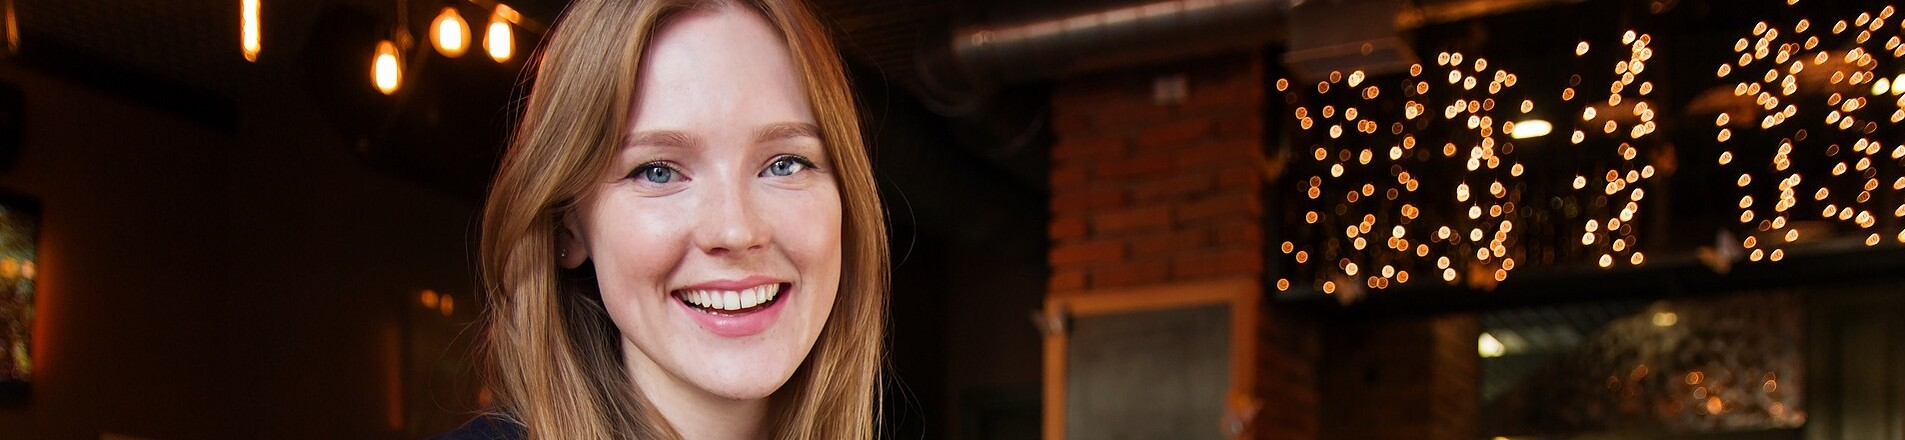 BBC: Set to Host its First TechWomen Hackathon in July, 2017